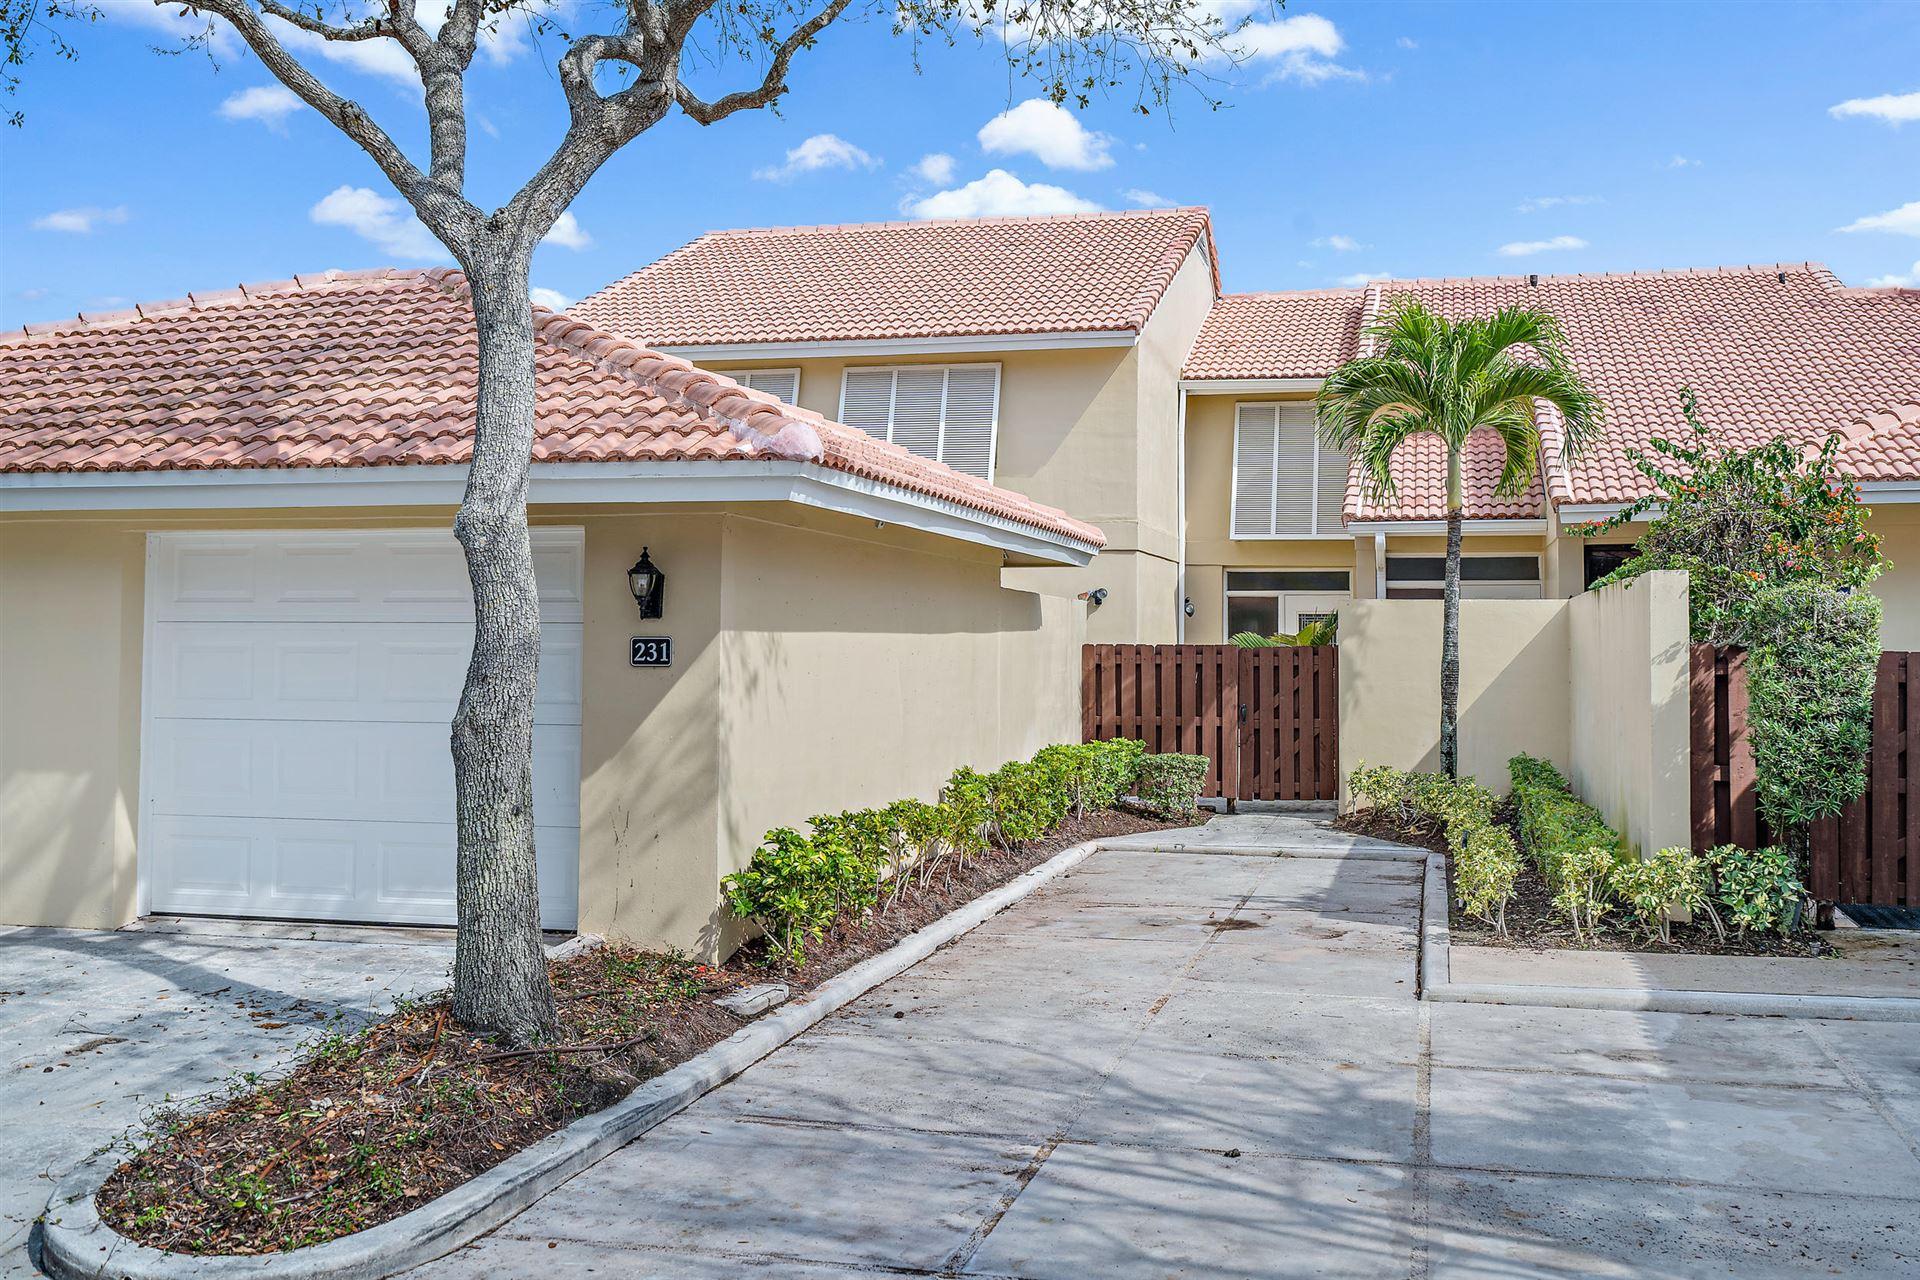 Photo of 231 Old Meadow Way, Palm Beach Gardens, FL 33418 (MLS # RX-10693306)